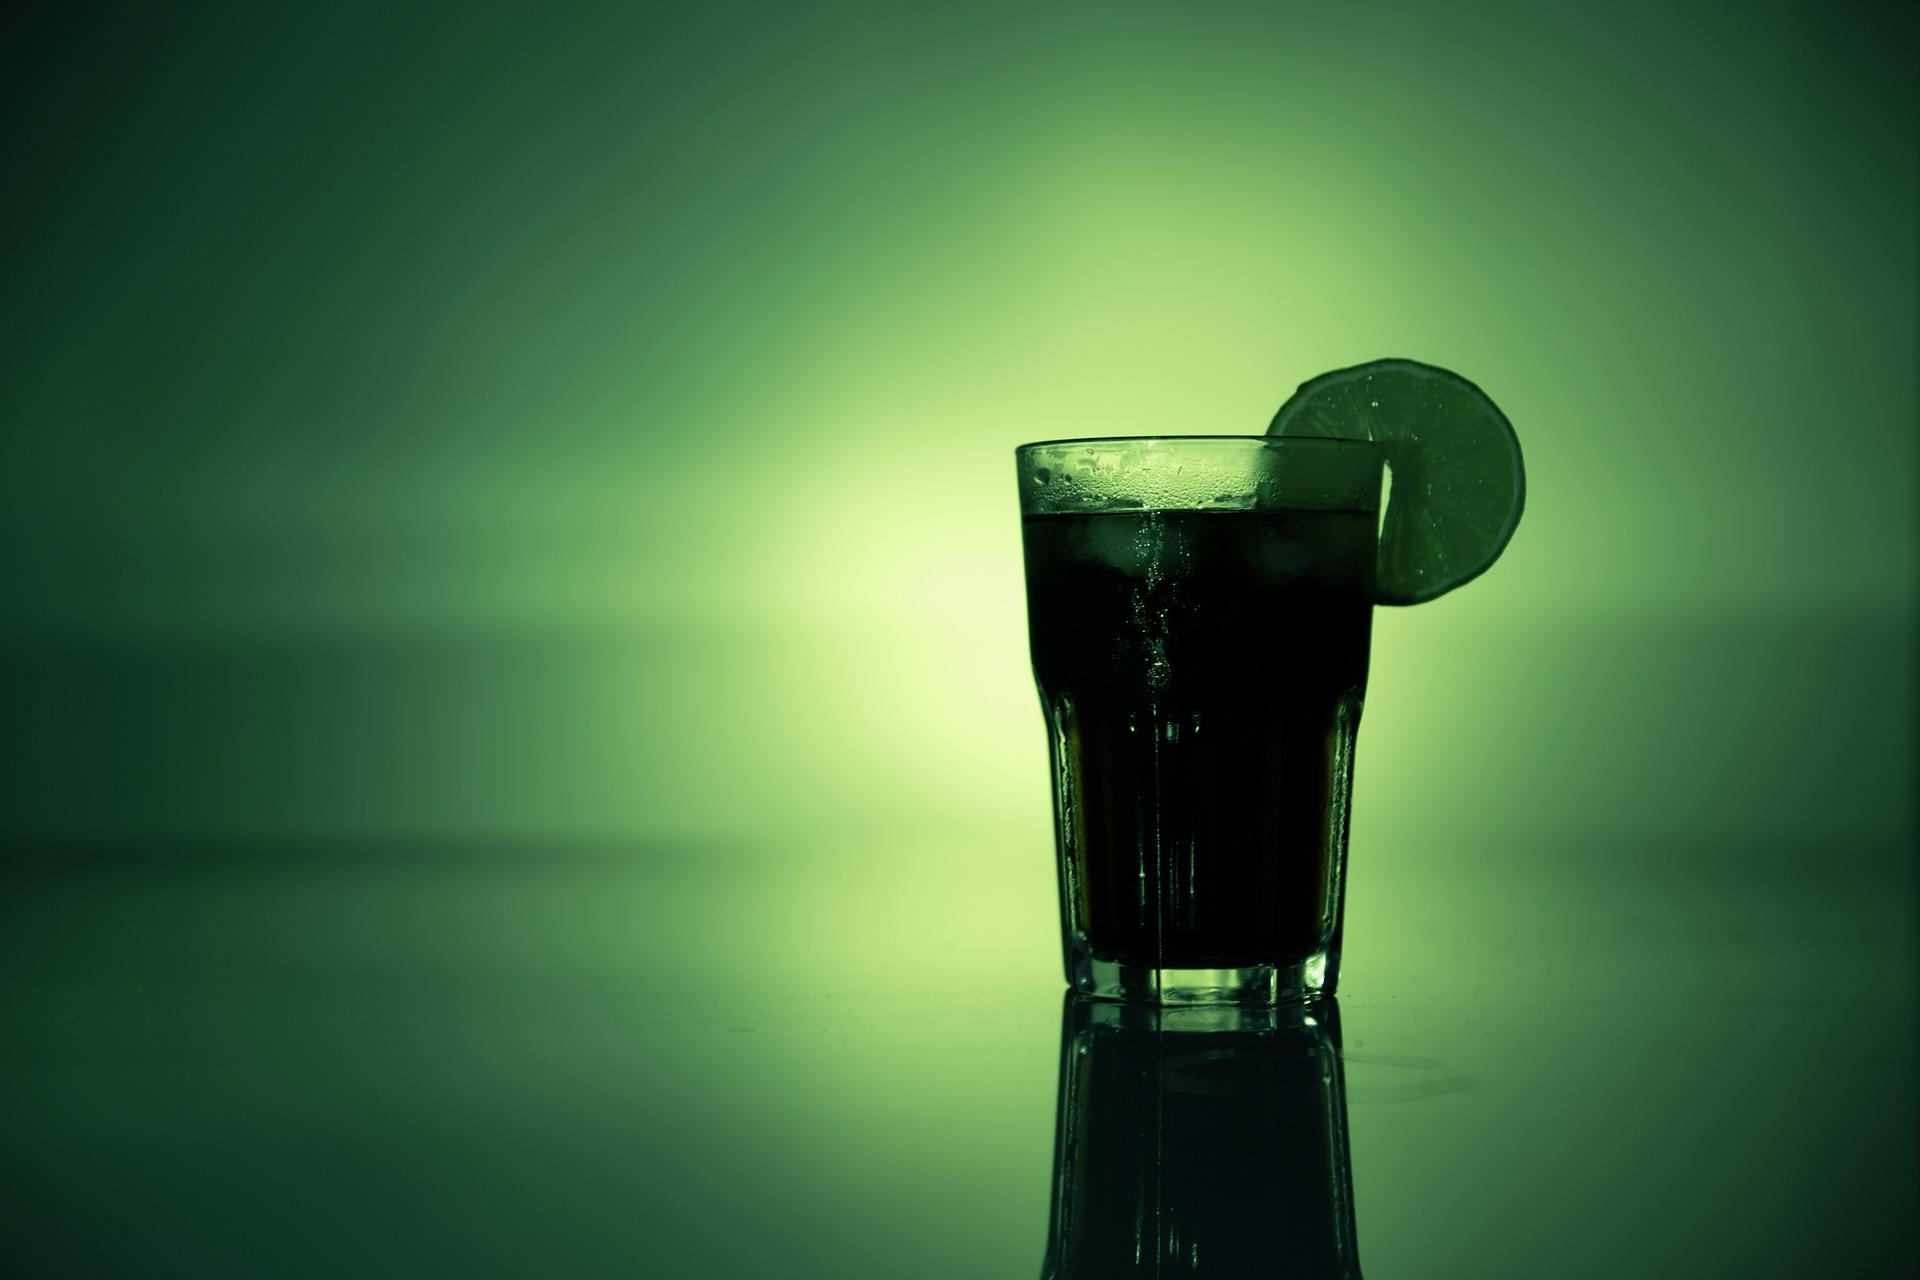 abandonar el consumo de alcohol